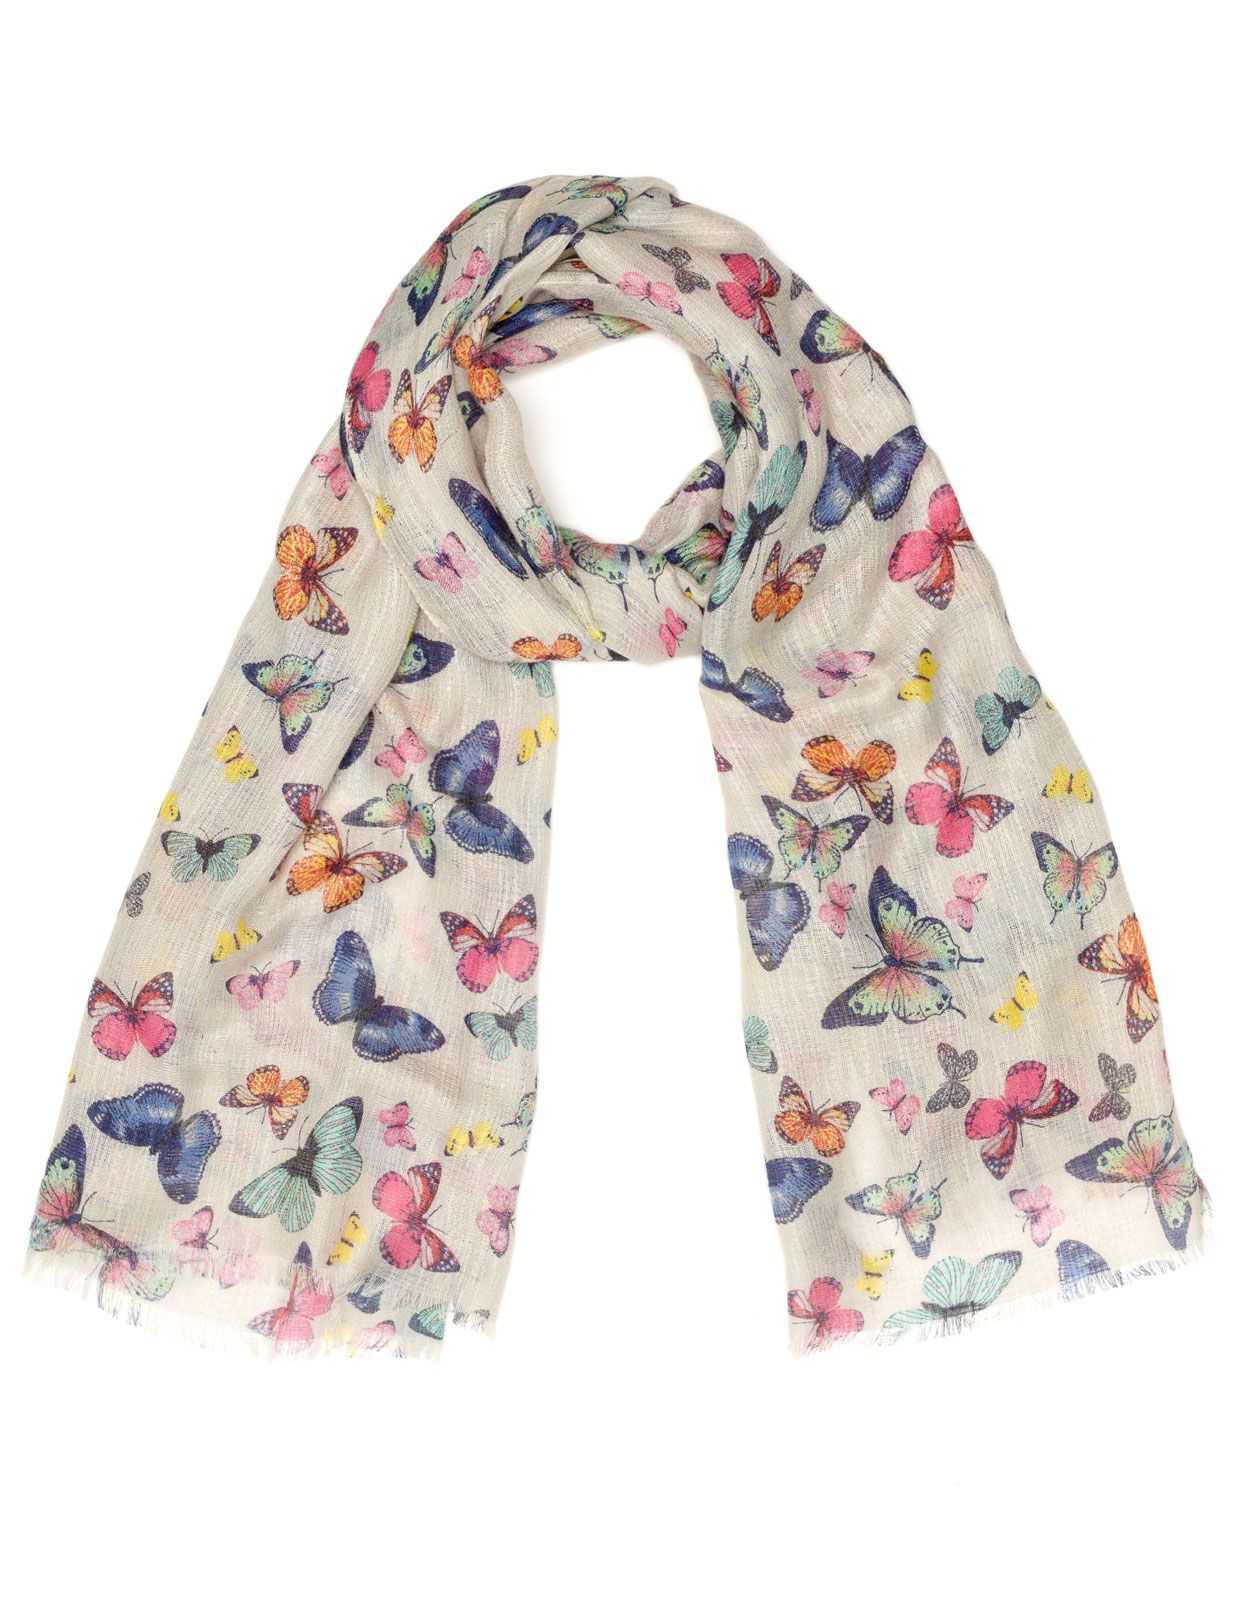 Sexy scarf